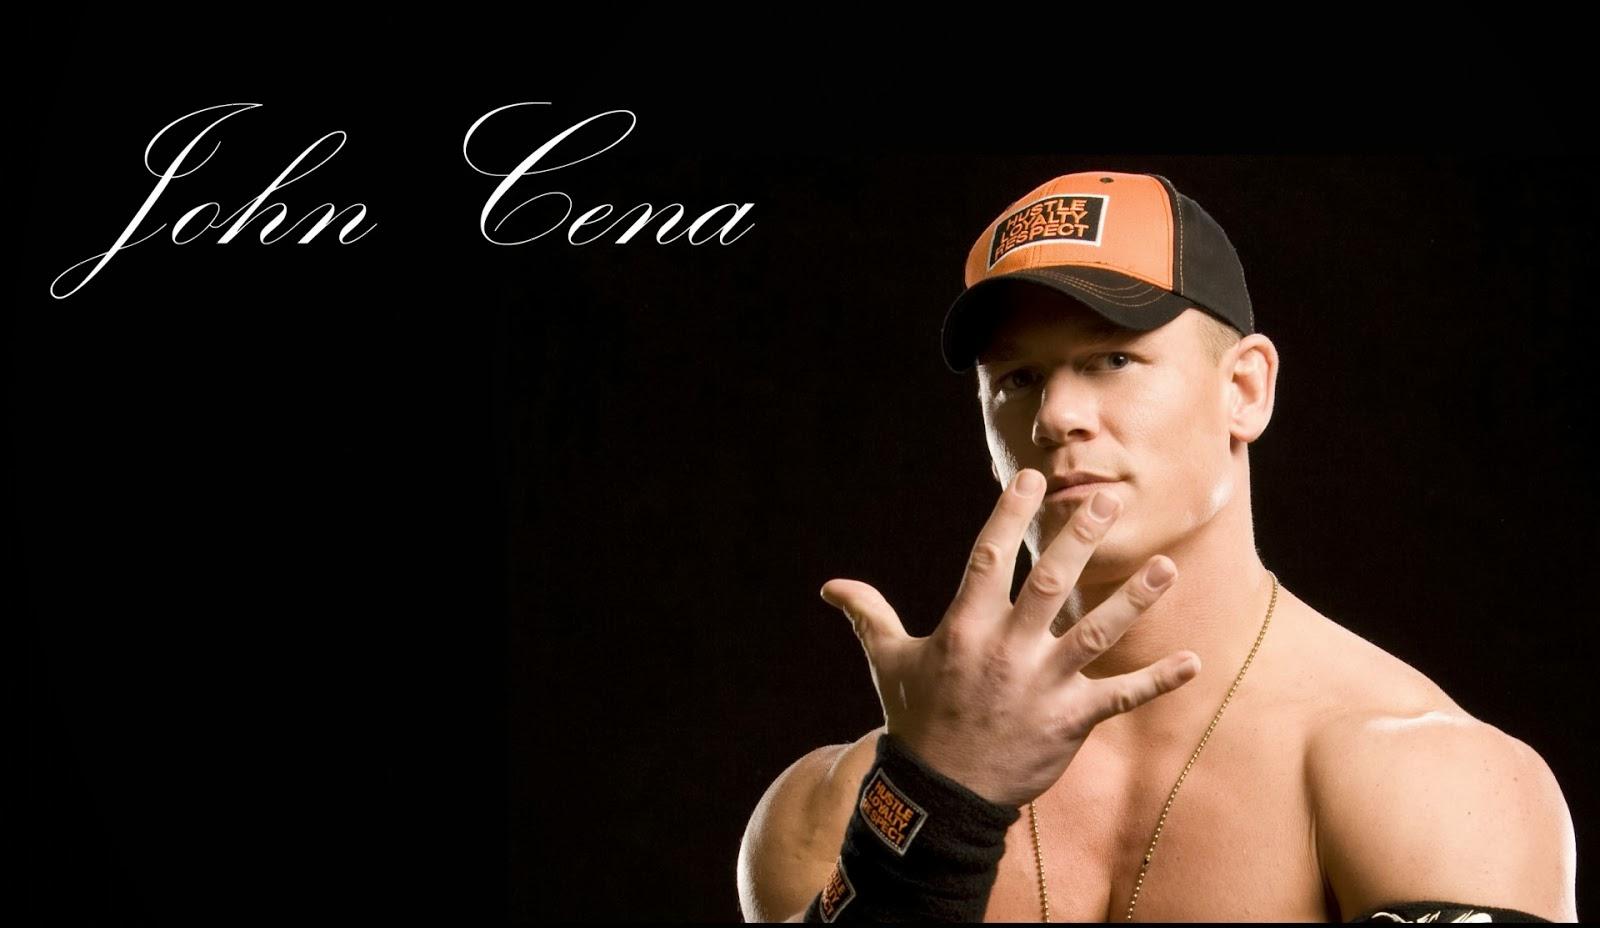 John Cena Hd Wallpapers Download WWE HD WALLPAPER FREE DOWNLOAD 1600x928